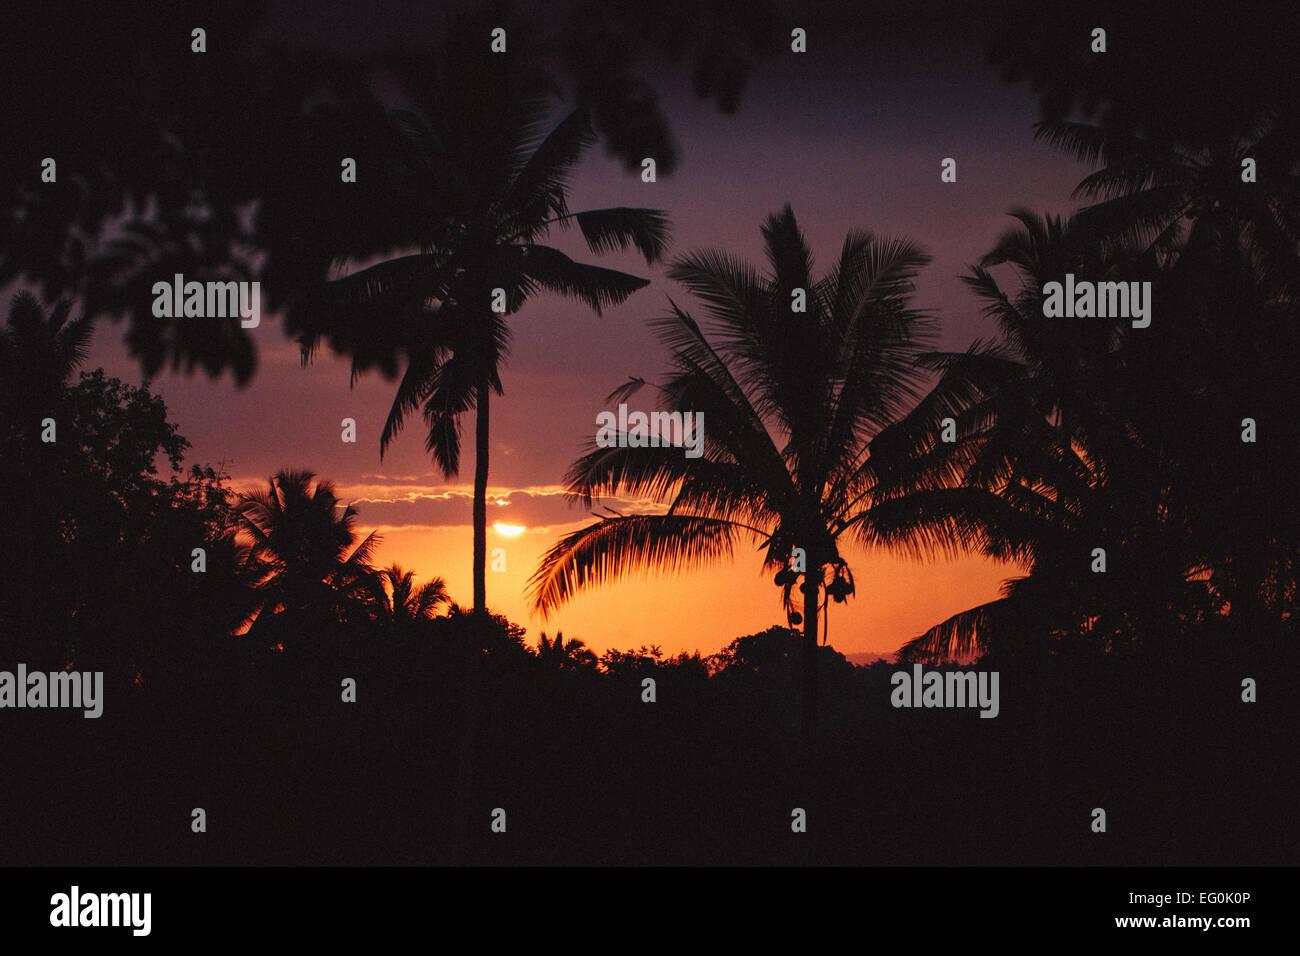 Indonesia, Bali, Ubud, Palm trees silhouetted against sunset Stock Photo